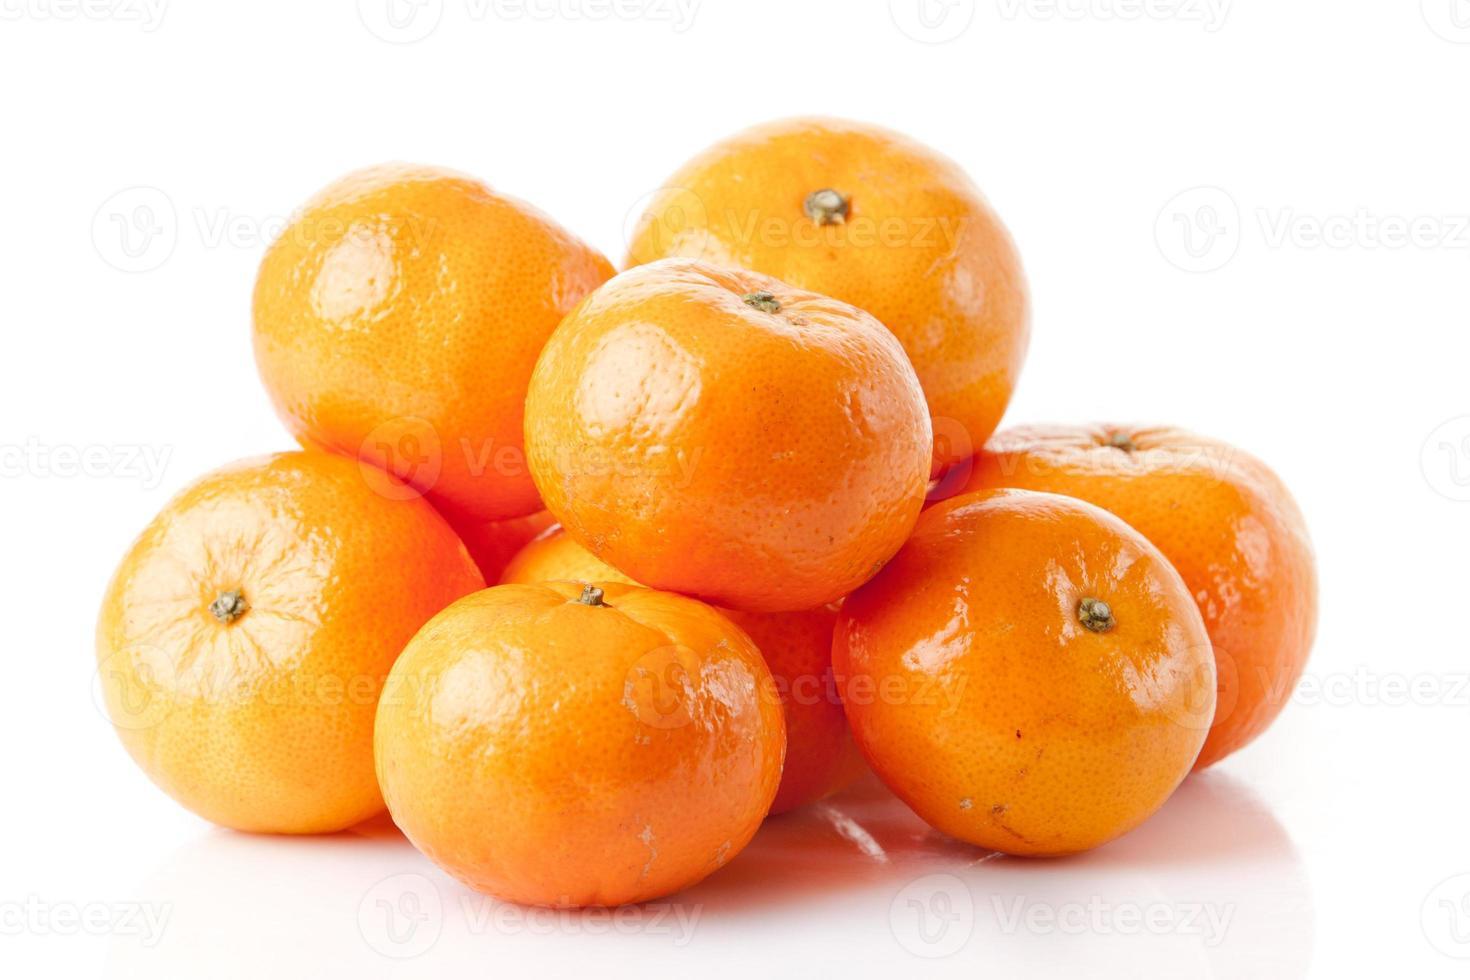 clementine photo